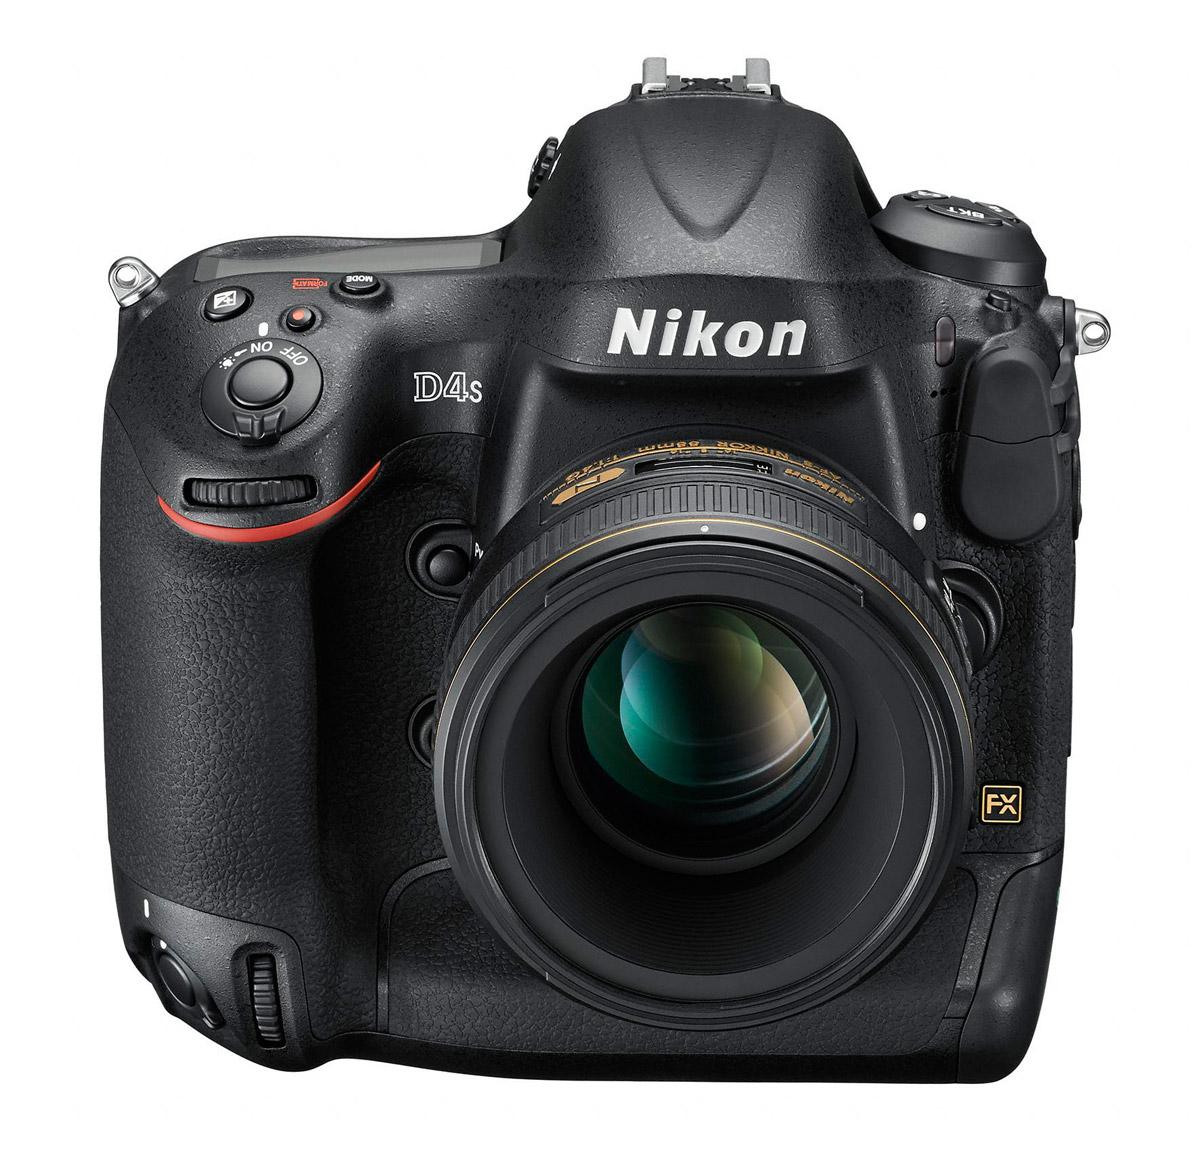 Nikon D4S - Upper Front View